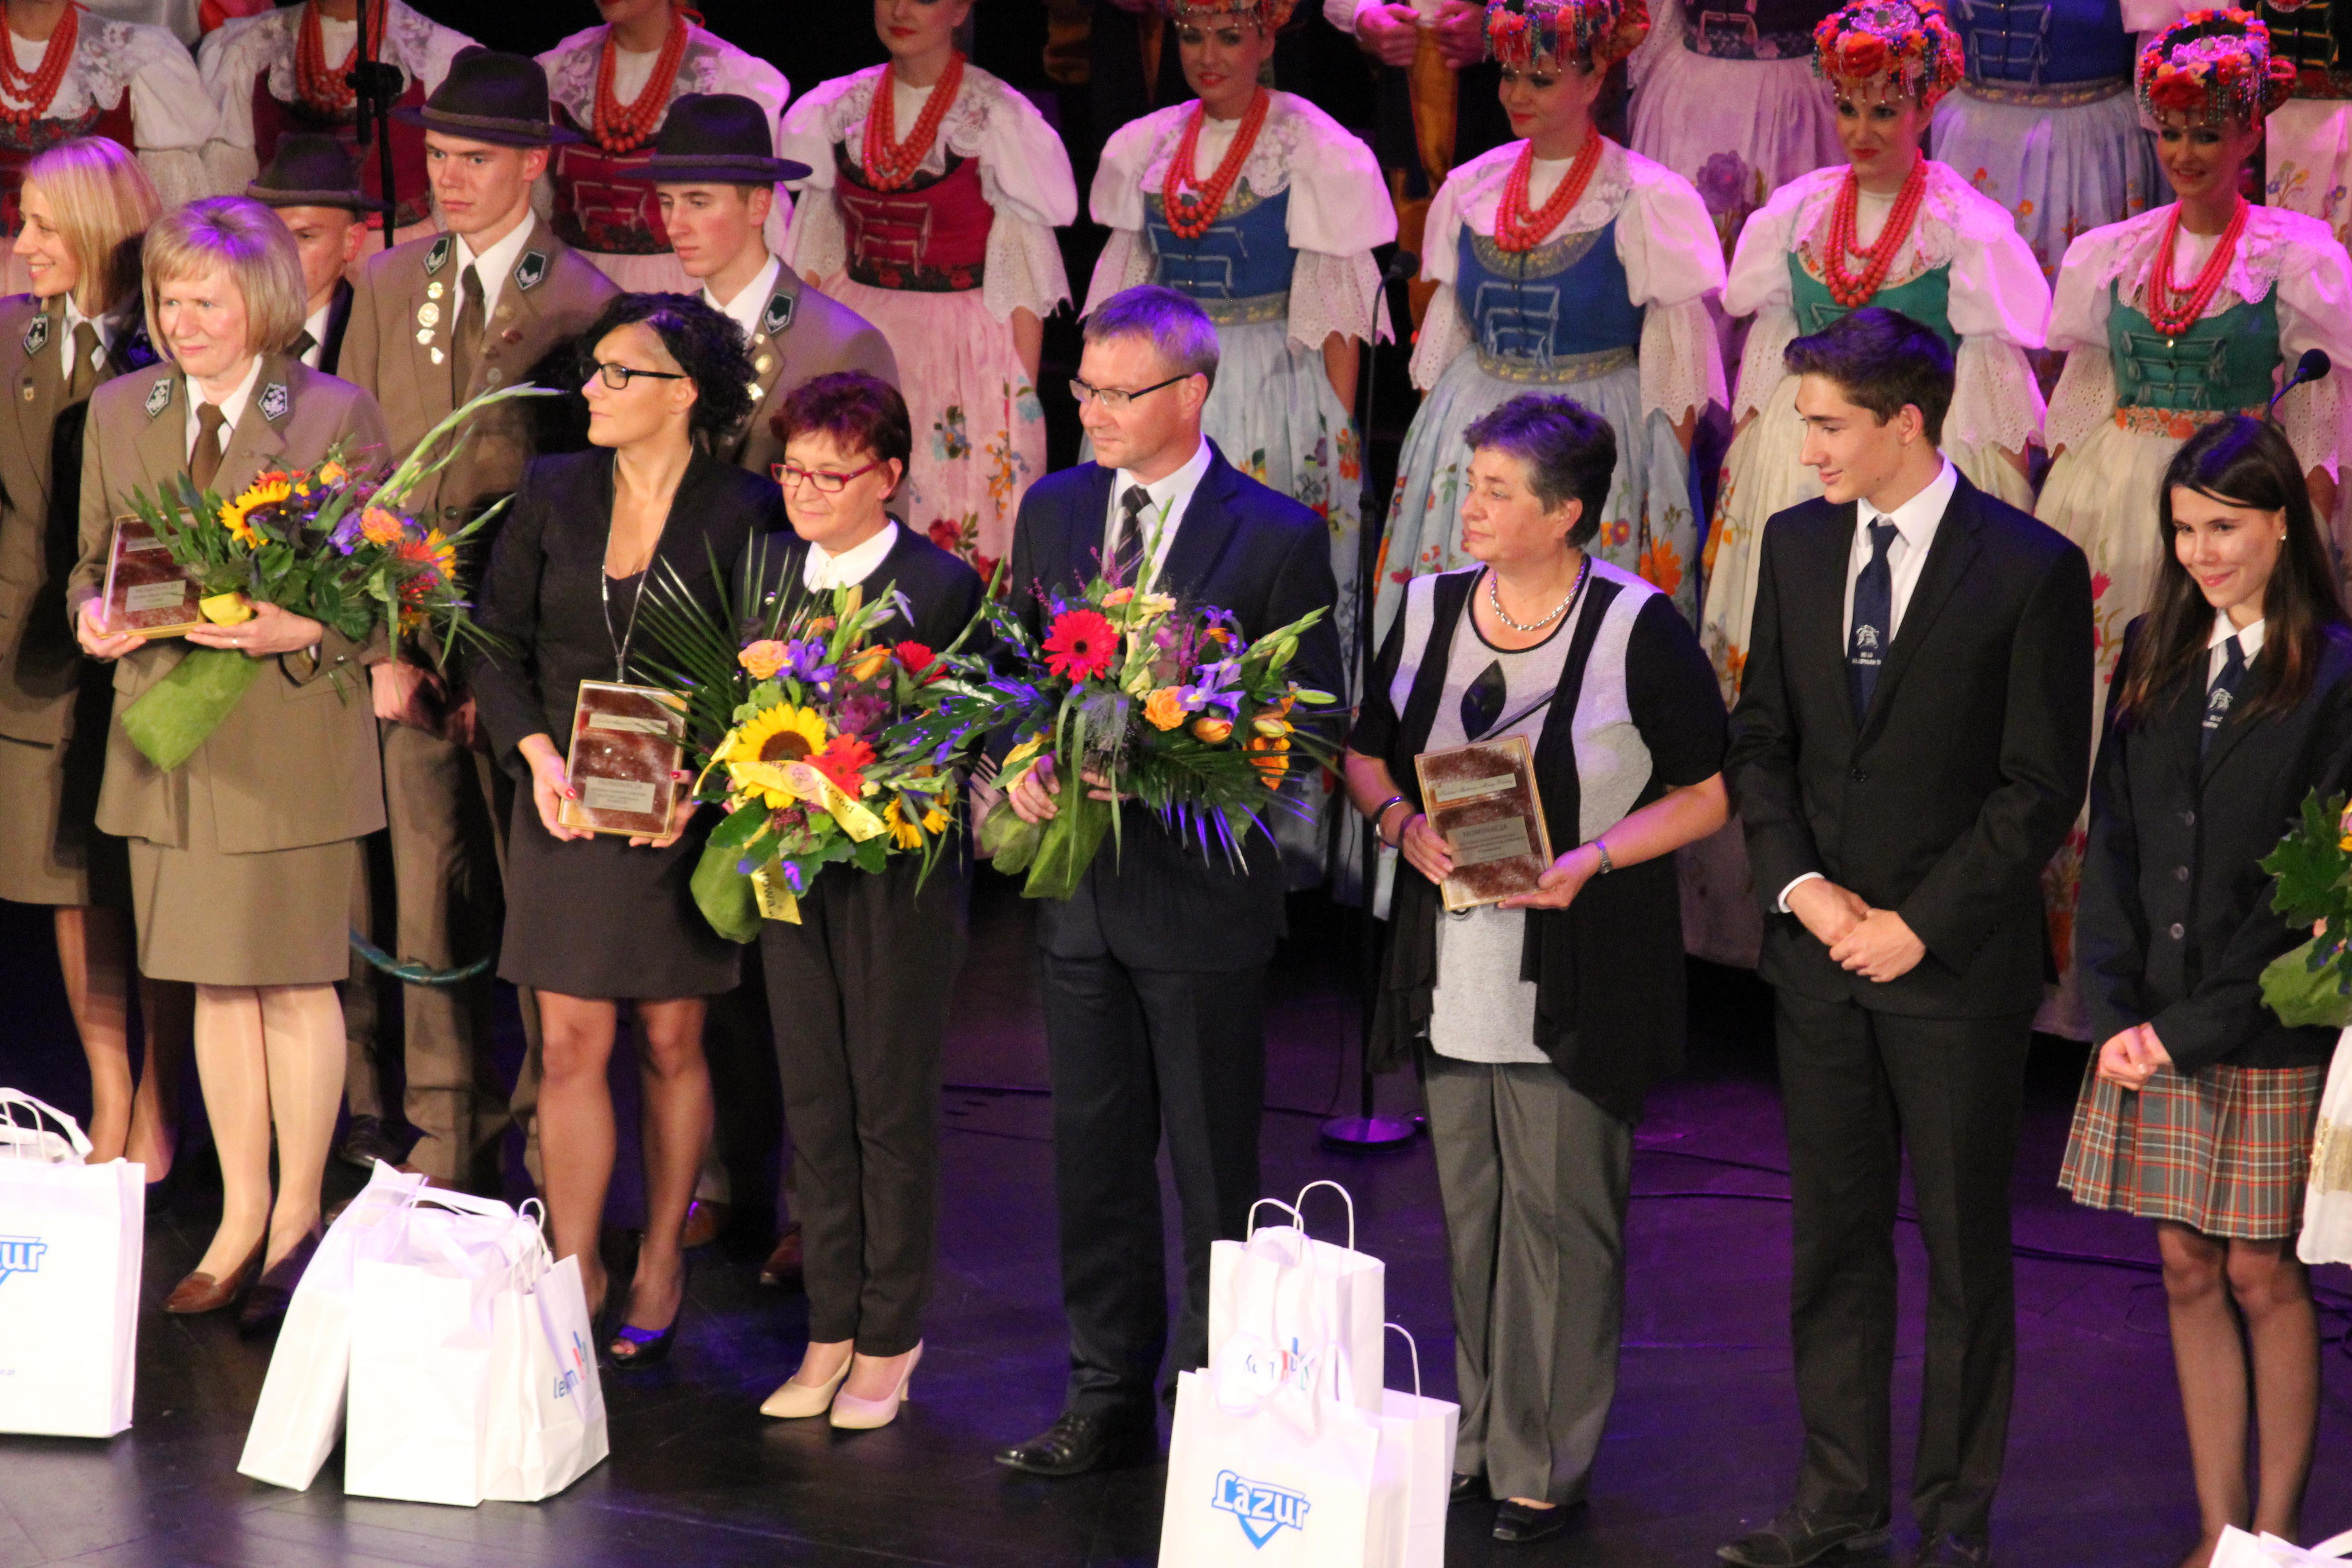 2015_09_21_IMG_MMP_Chorzów_0532